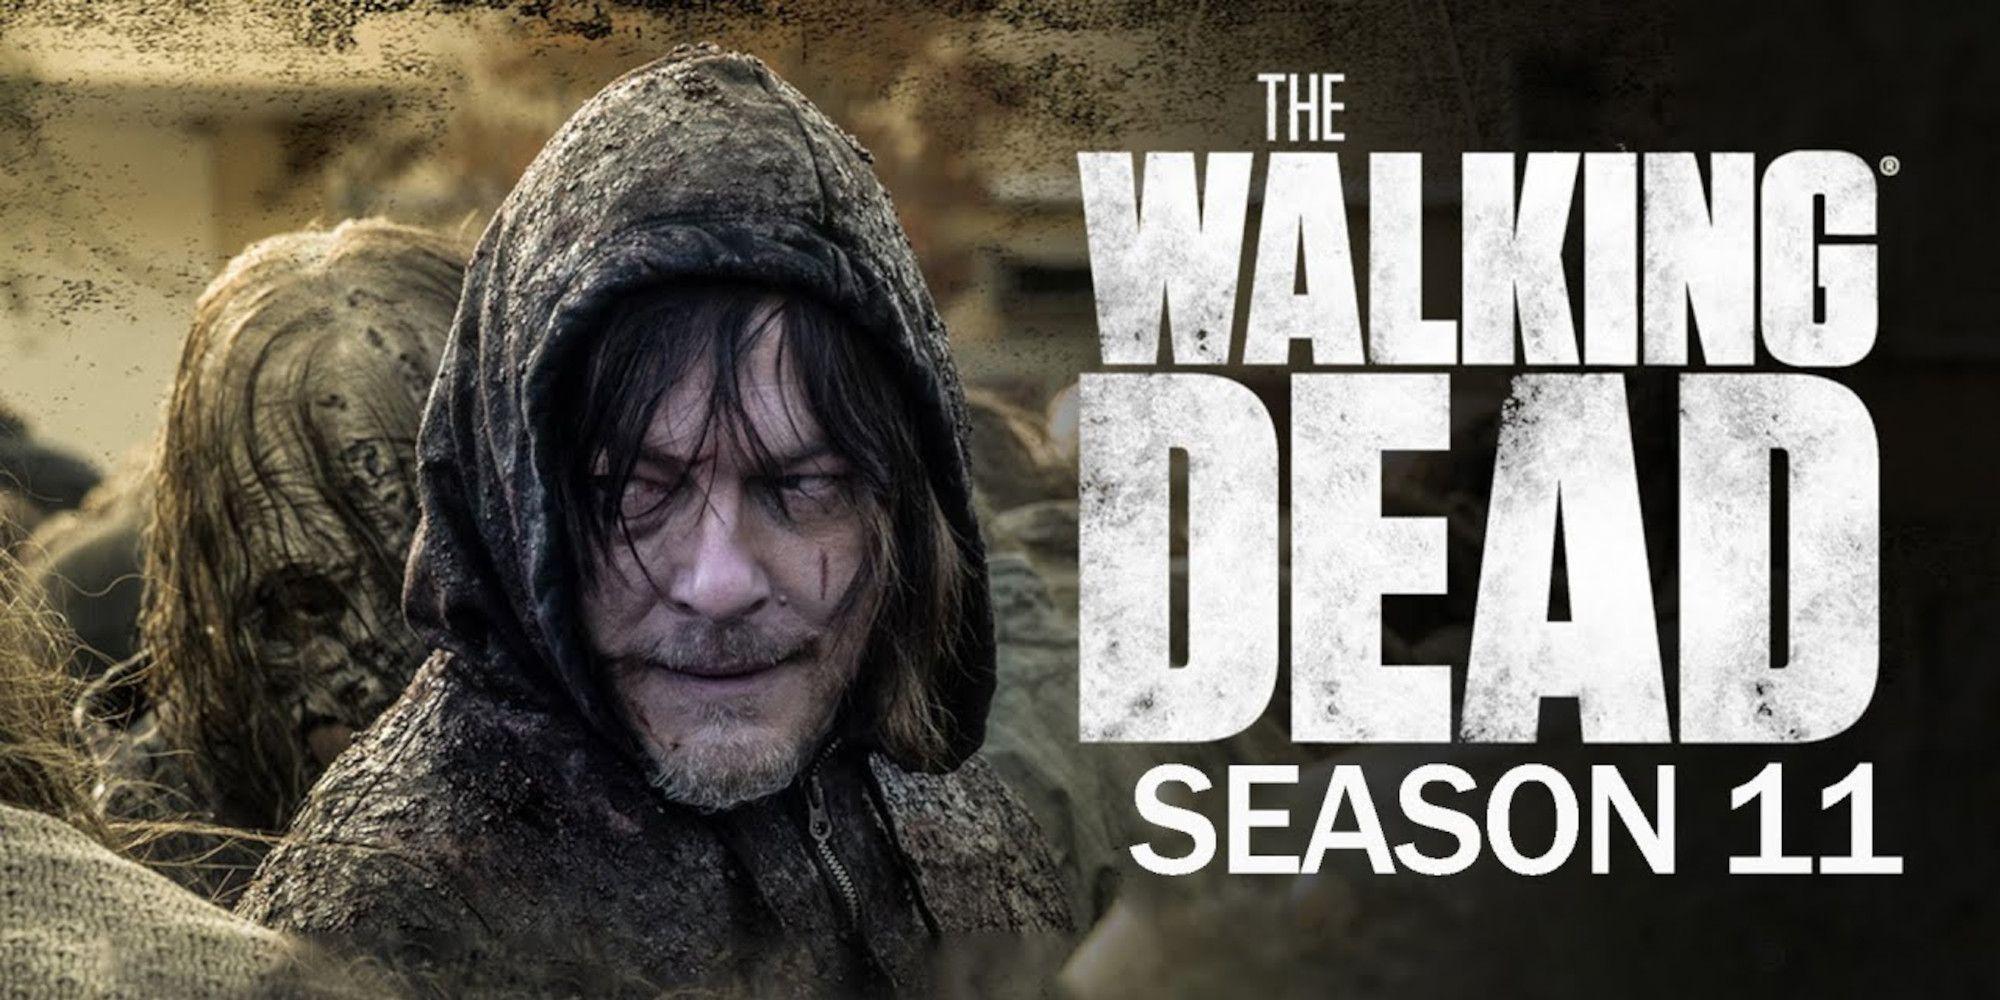 The Walking Dead Announces Season 11 Premiere Date | CBR